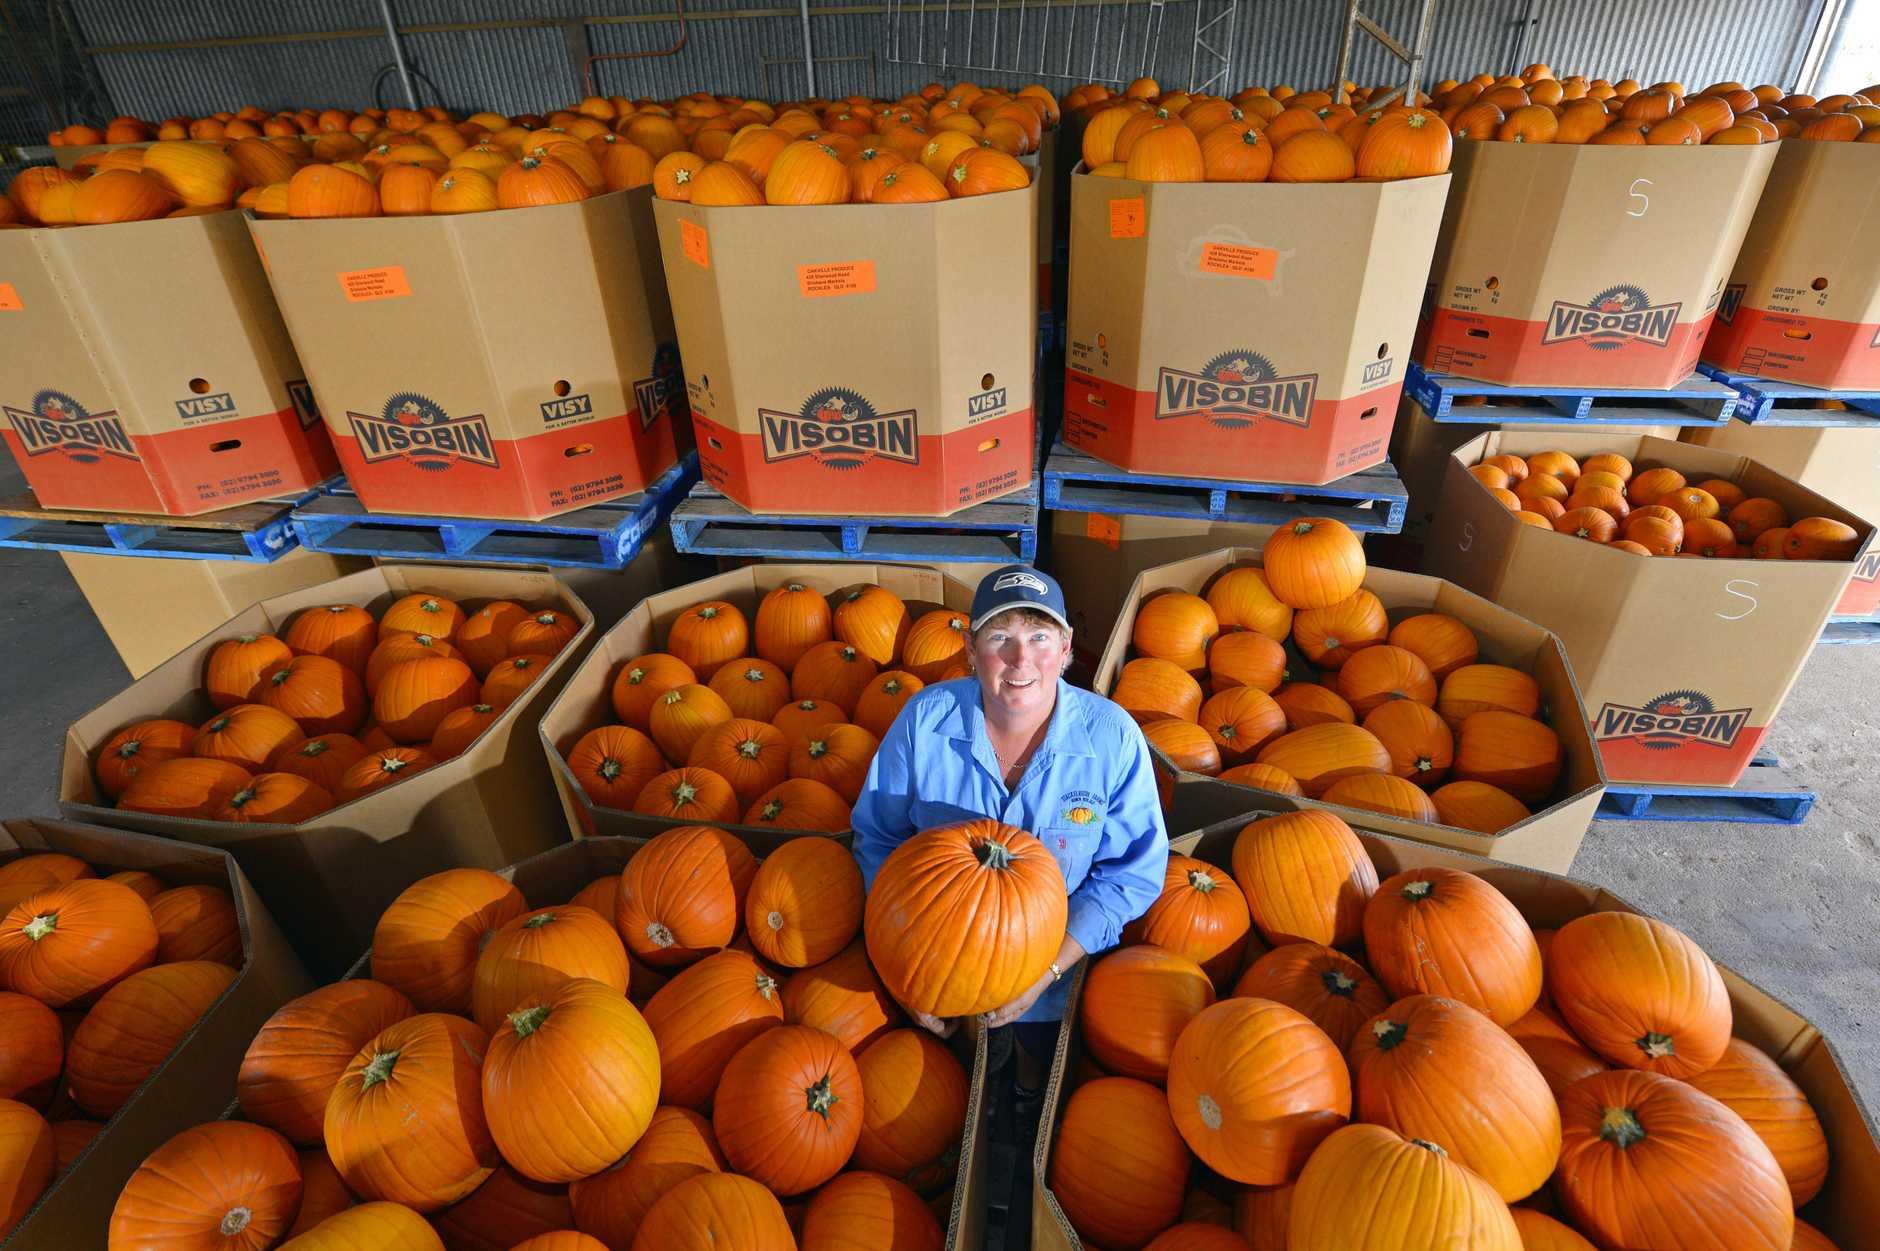 CARVING UP: Queenslanders can carve their own Halloween pumpkins grown in their home state by Bowen based Stackelroth Farms pumpkin grower Belinda Williams